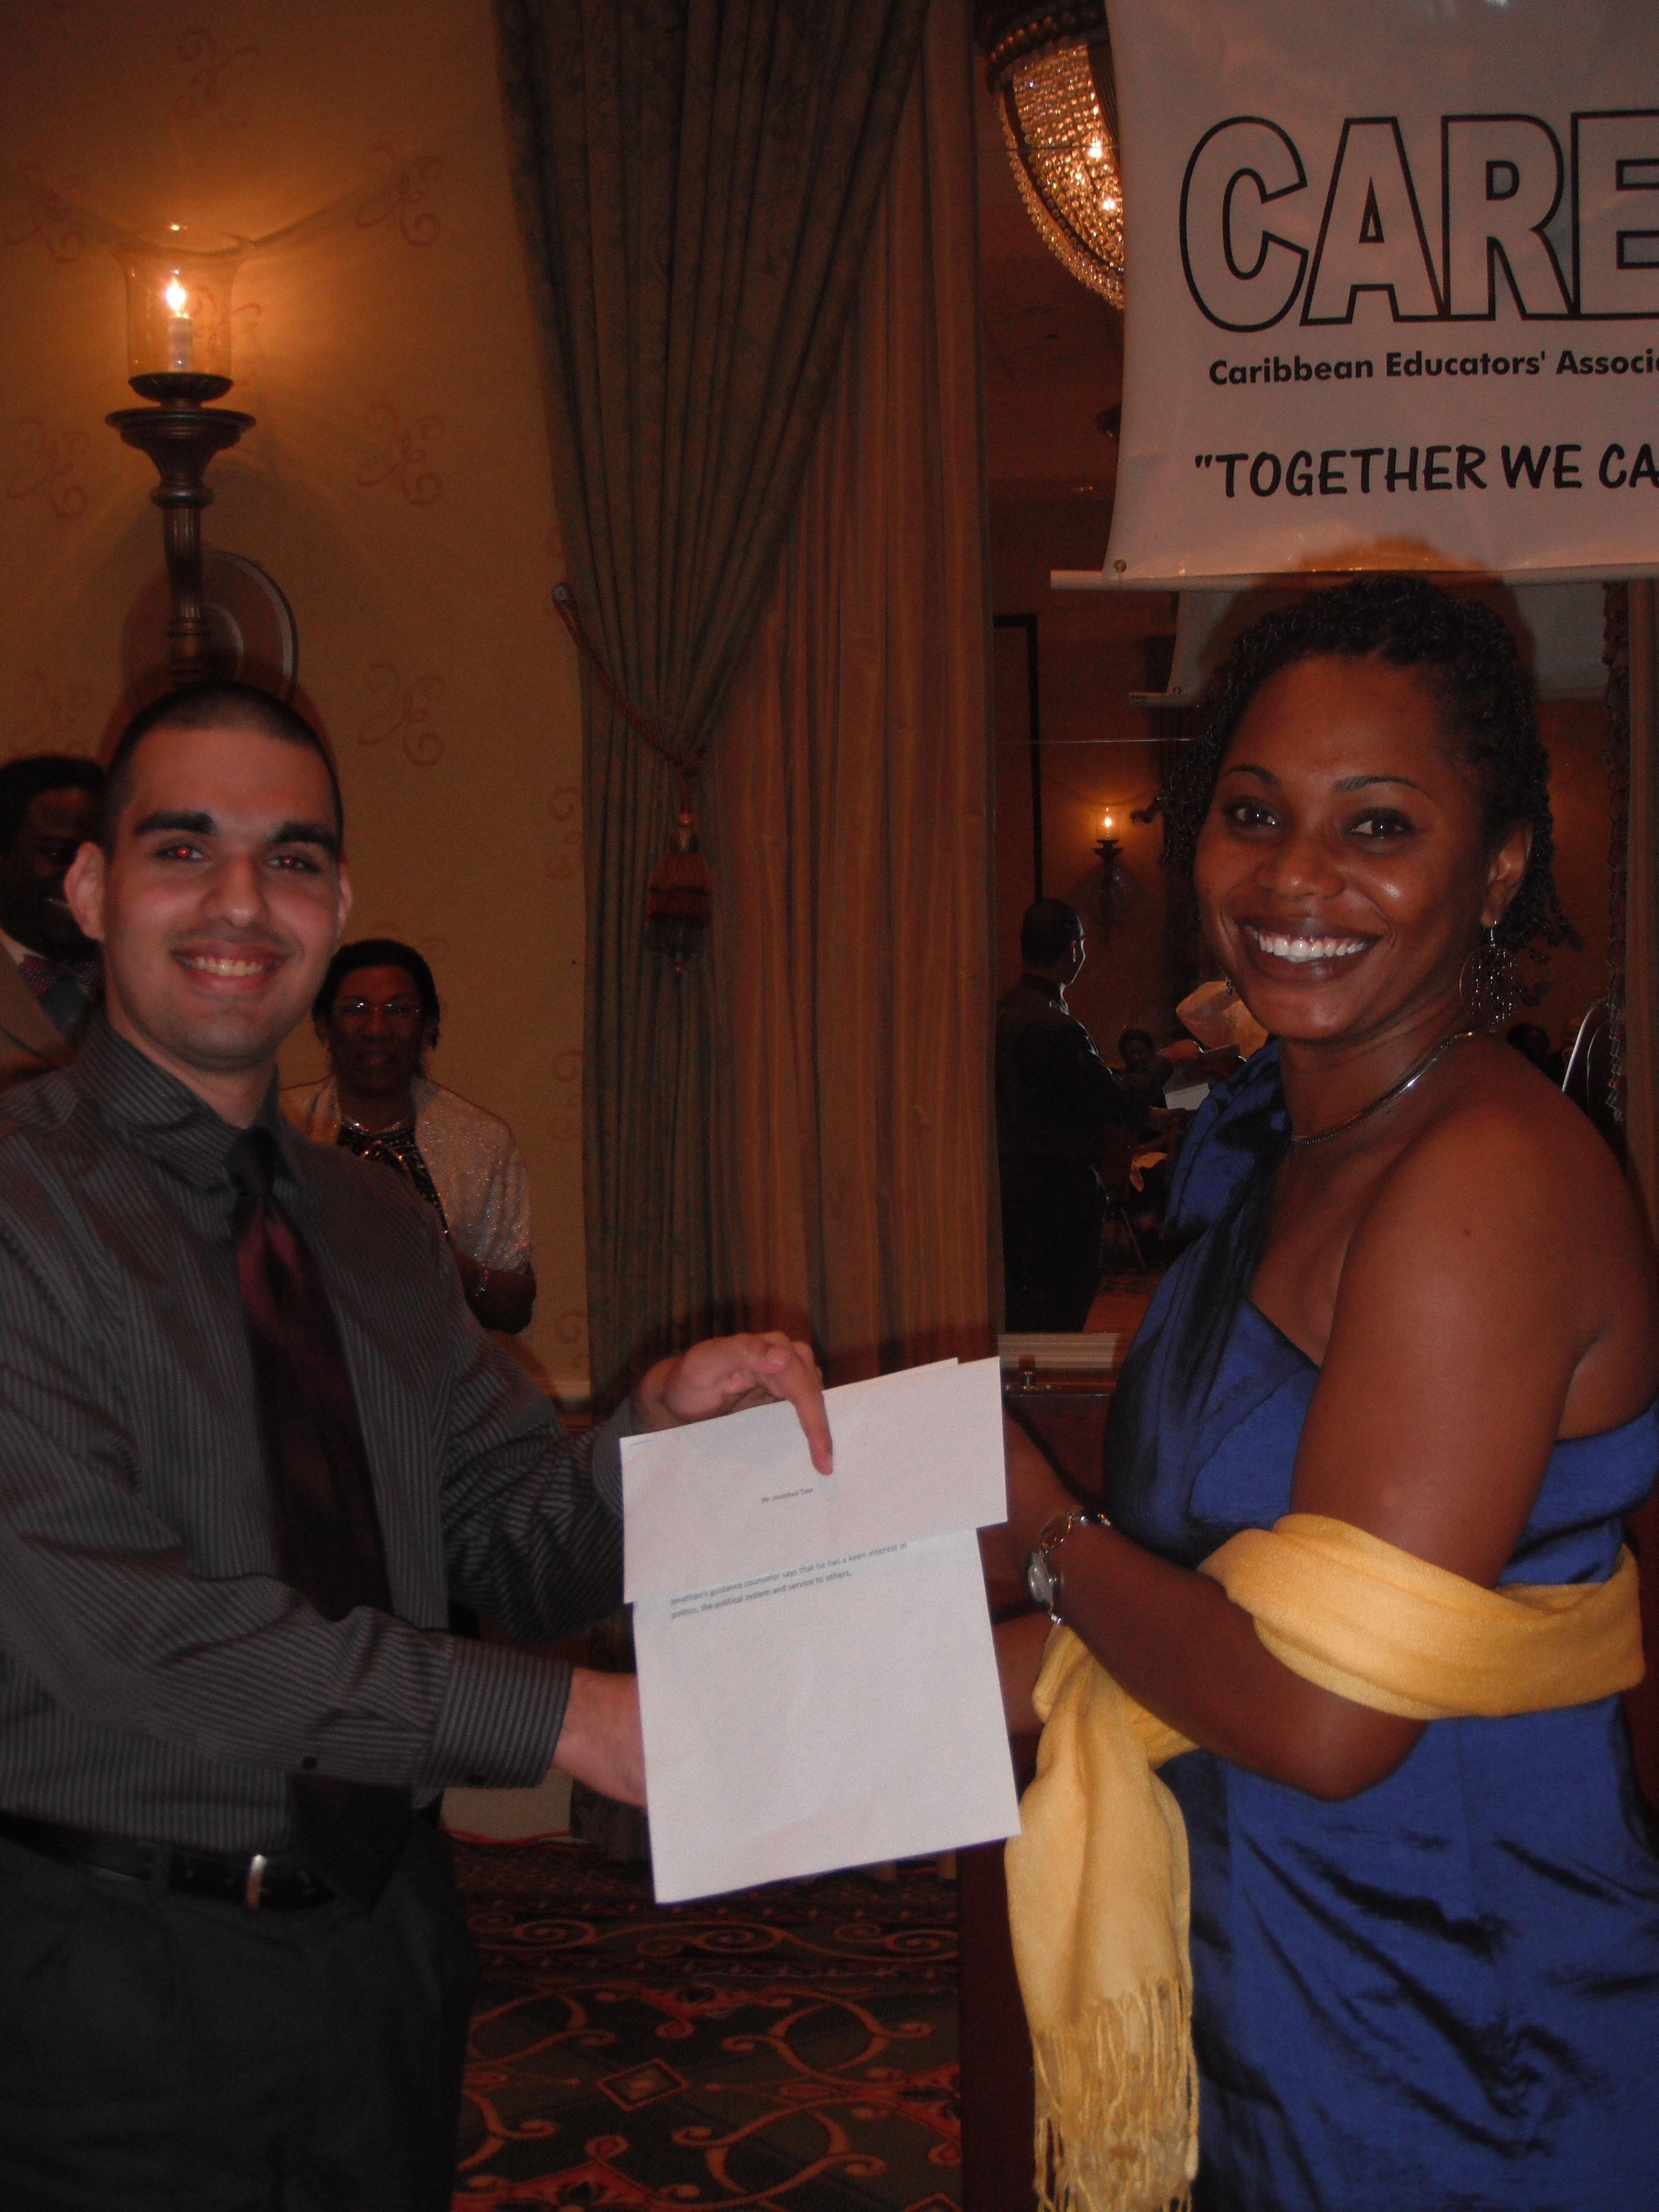 9 Scholarship Recipient with Presenter at Caribbean Educators Association Annual Scholarship Awards 2012